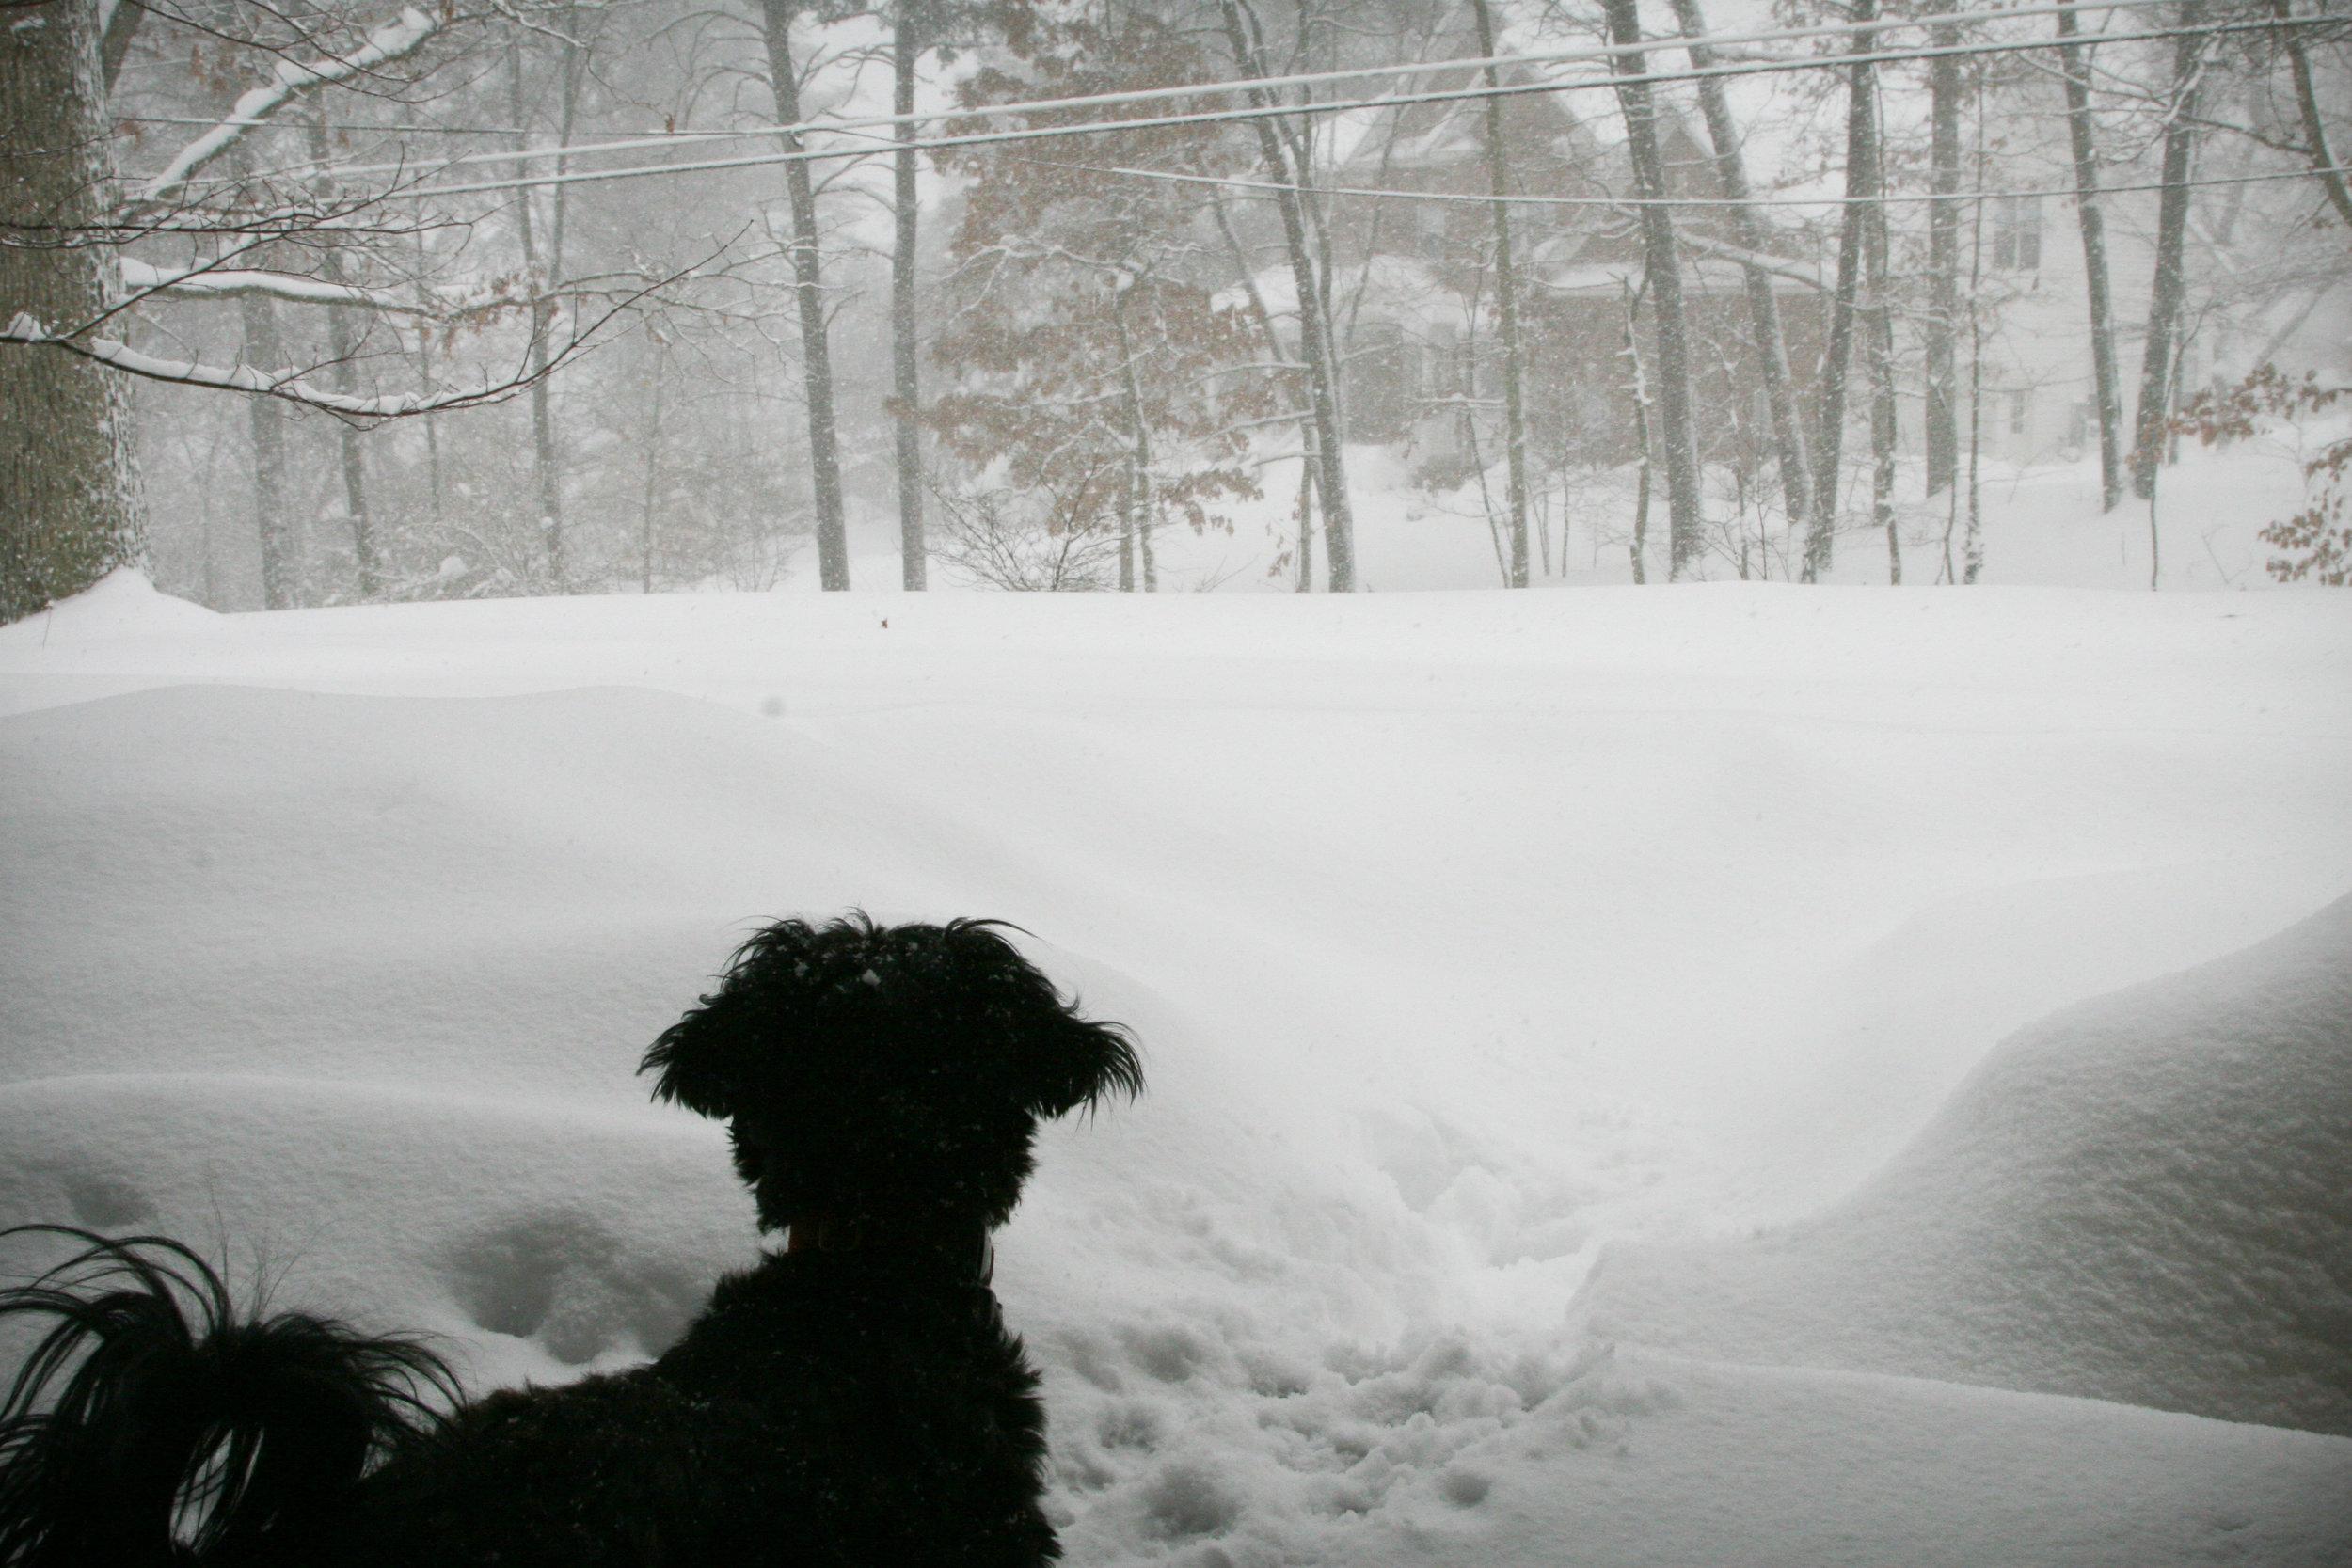 Snowpocolypse III - February 2010 - Annandale Virginia